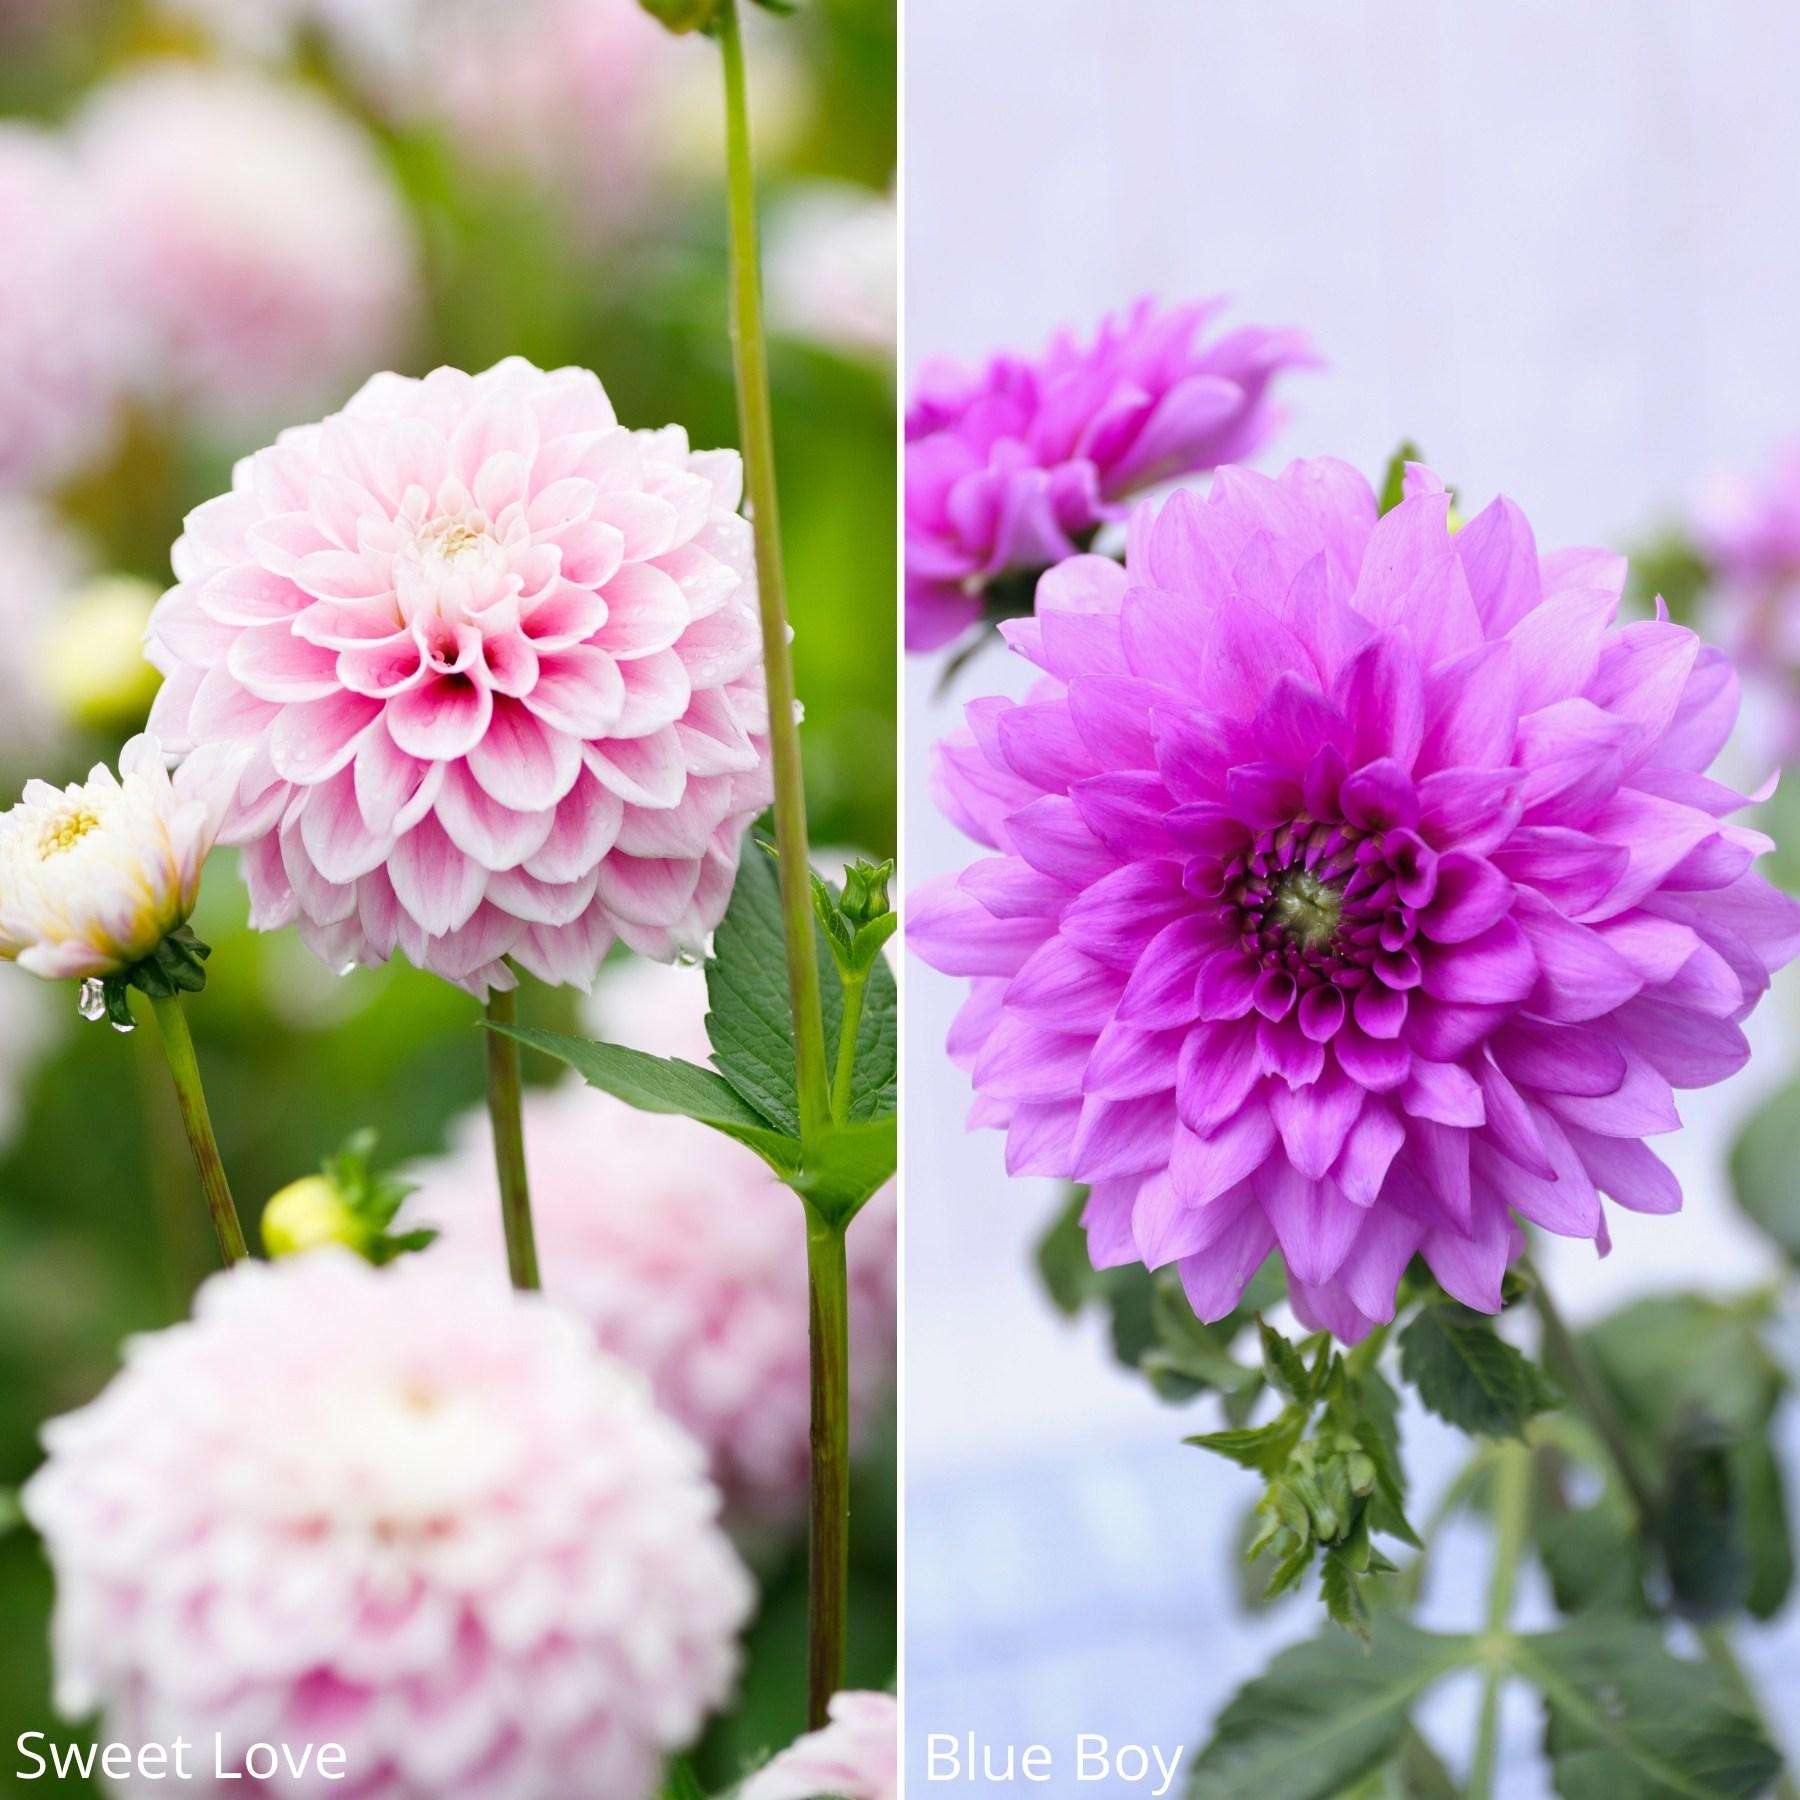 14 New Dahlias for Your Flower Garden - Longfield Gardens